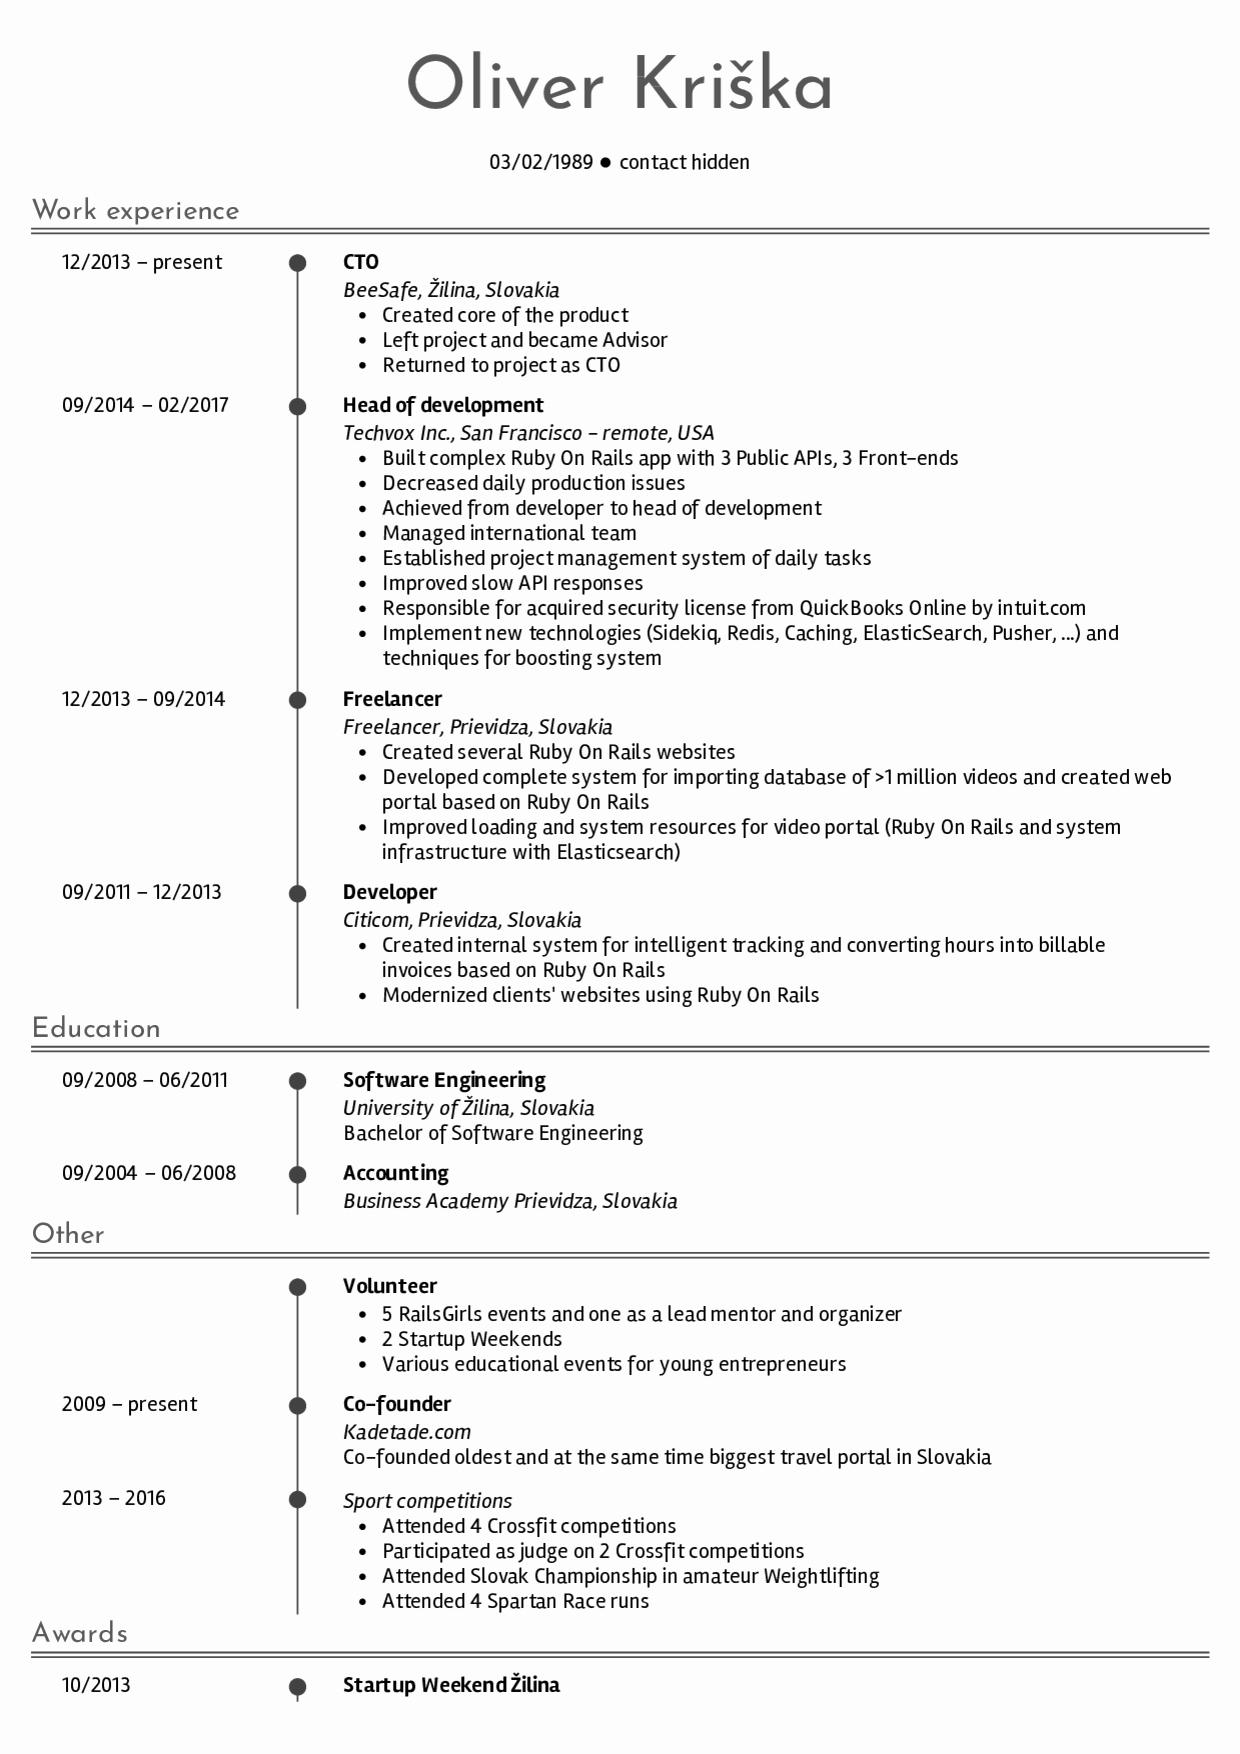 Web Developer Resume Sample Inspirational Resume Examples by Real People Senior Web Developer